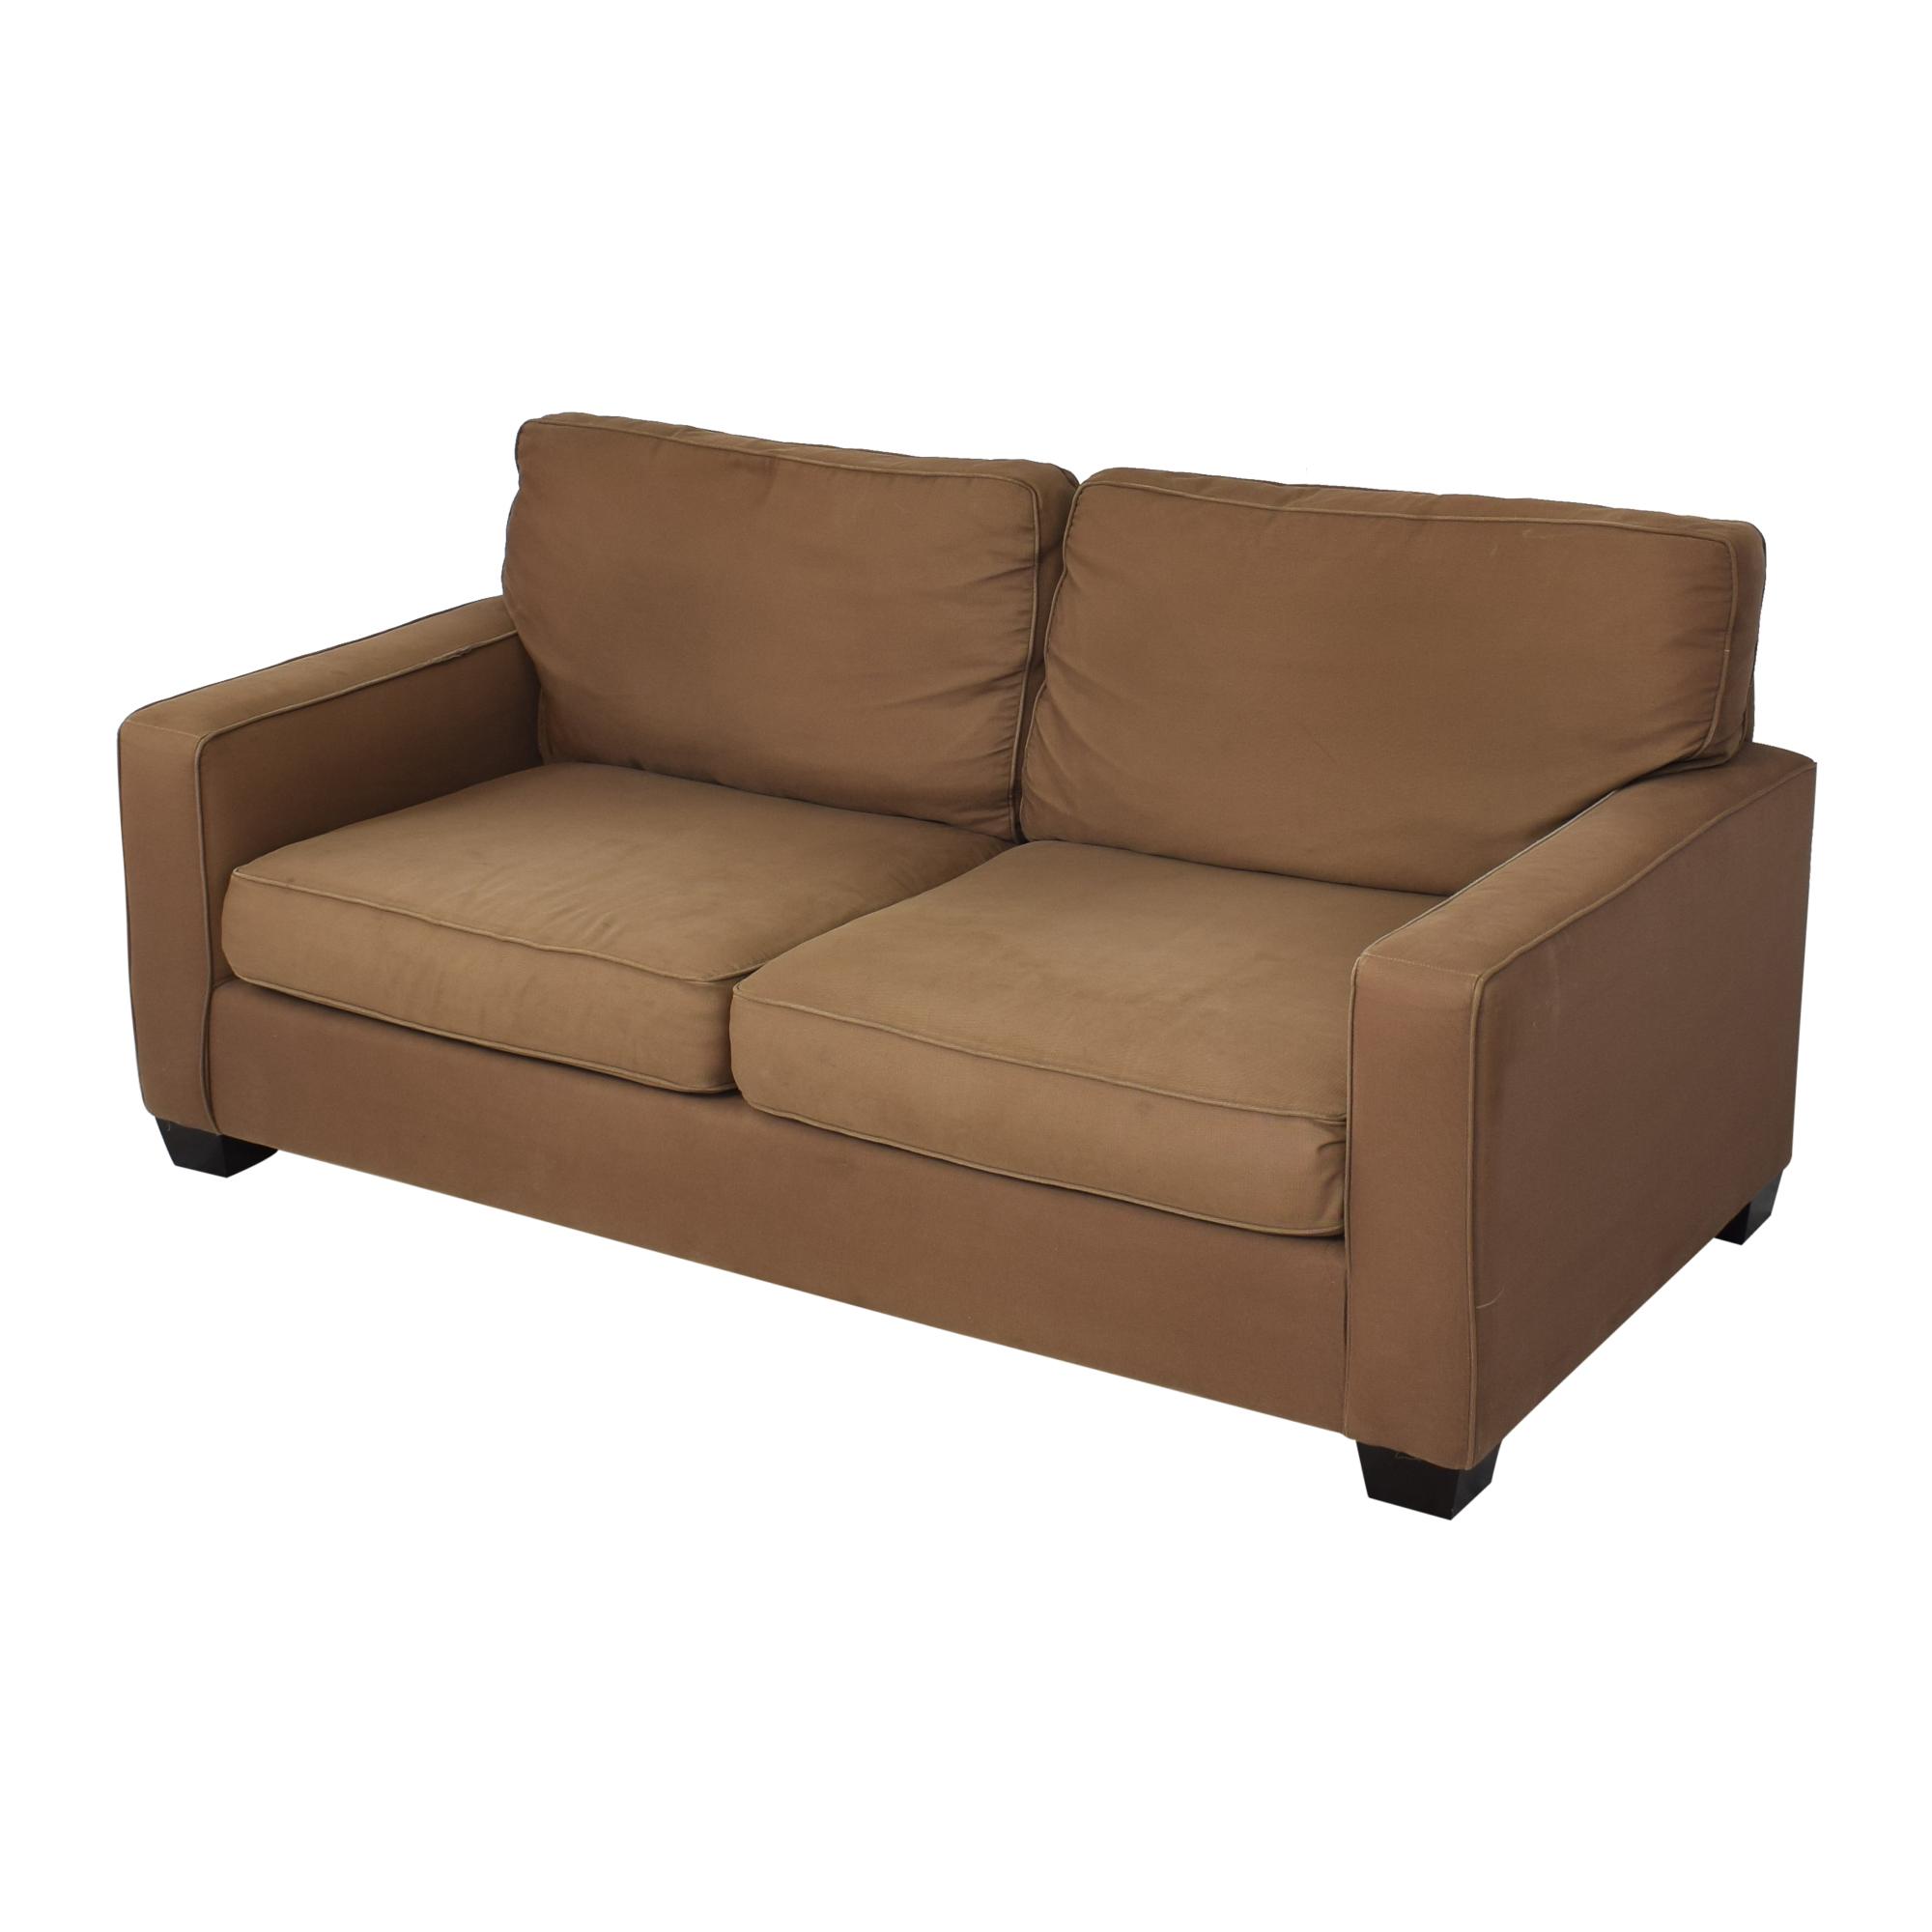 Pottery Barn Pottery Barn PB Comfort Square Arm Upholstered Sofa